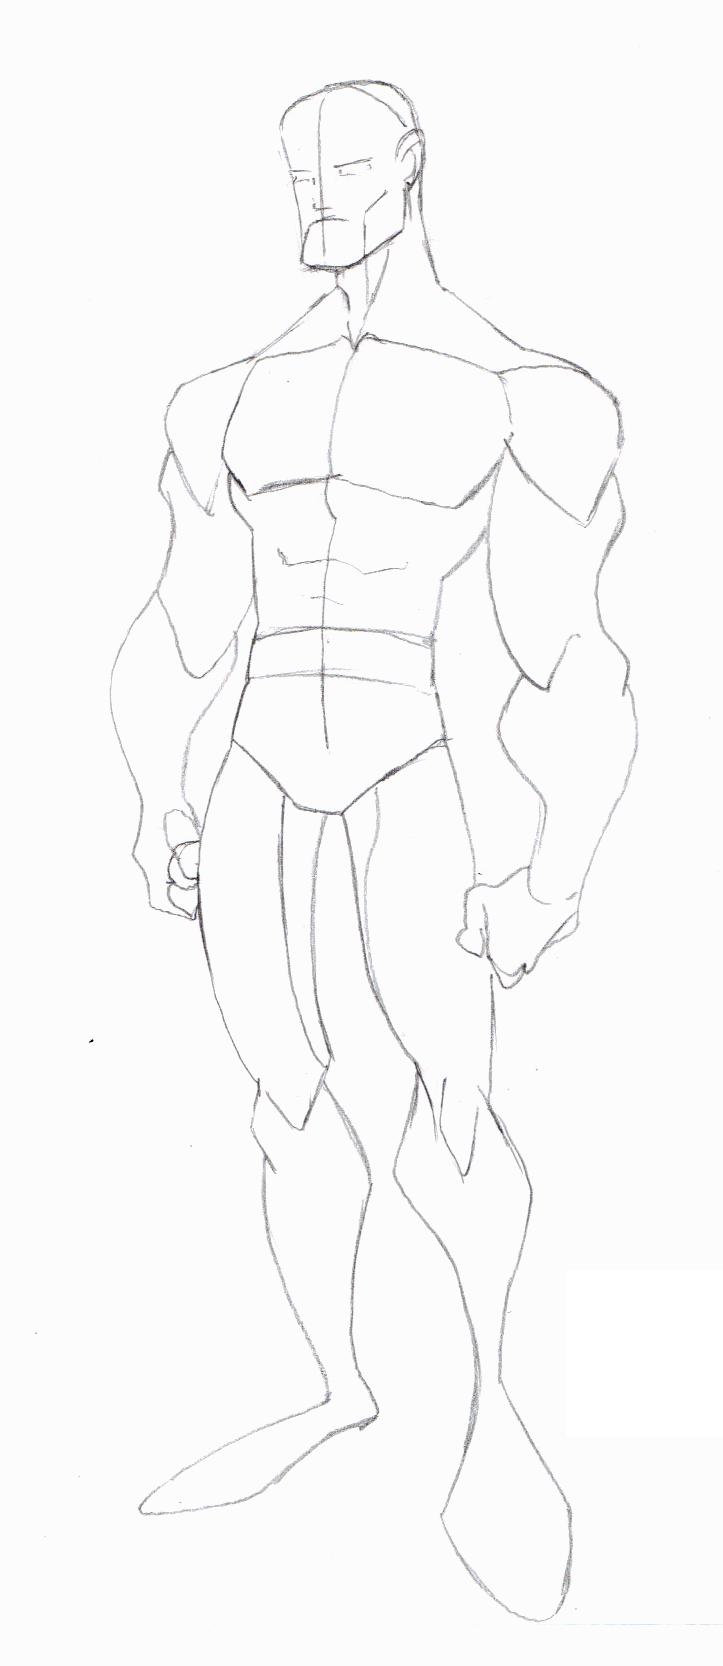 Animated Male Body Sketch 1 by skywarp-2